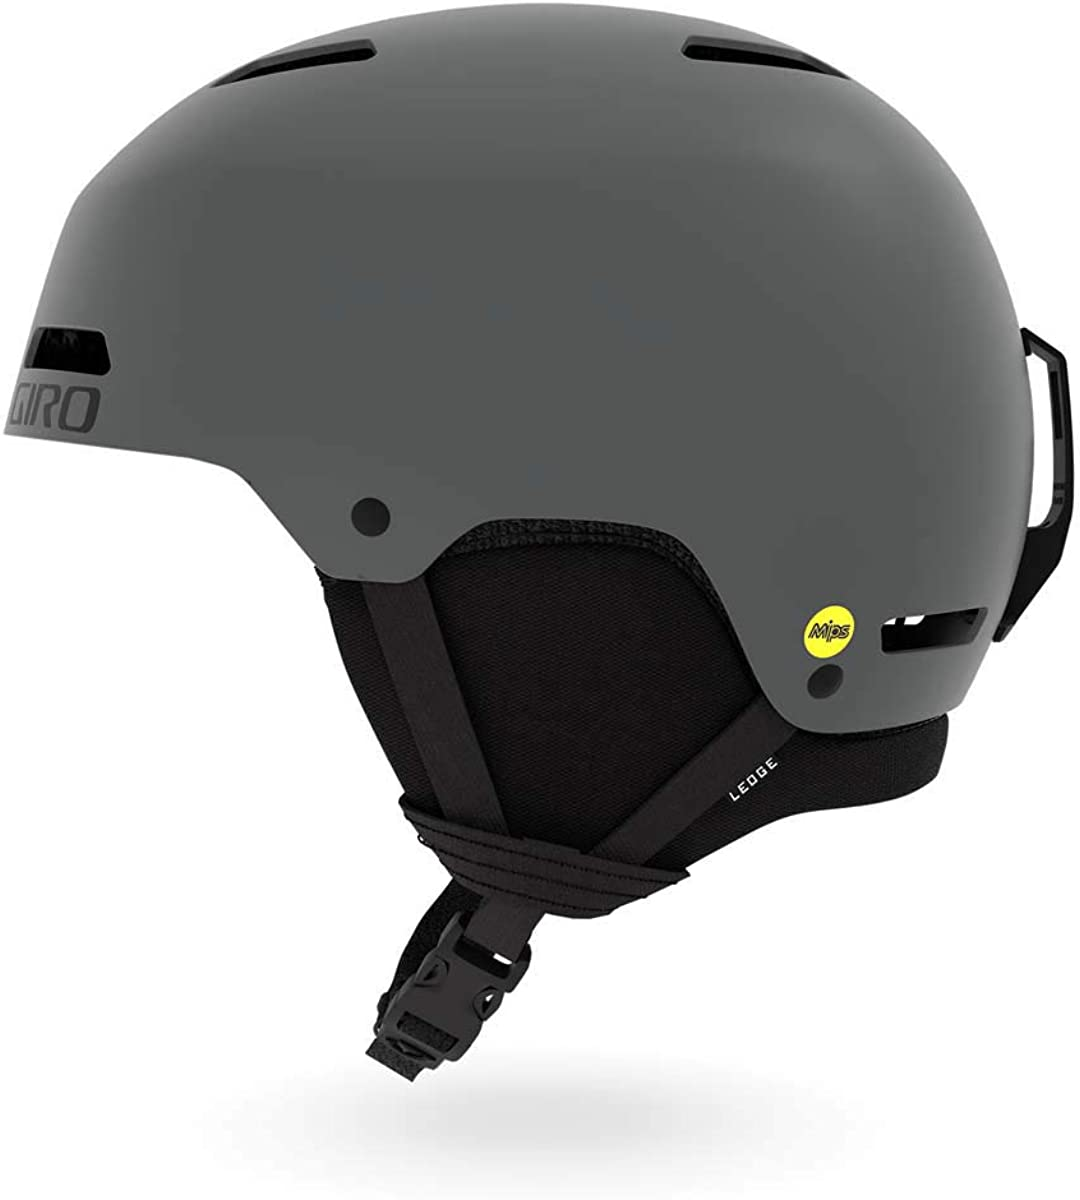 Giro Ledge FS (Fit System) MIPS Snow Helmet